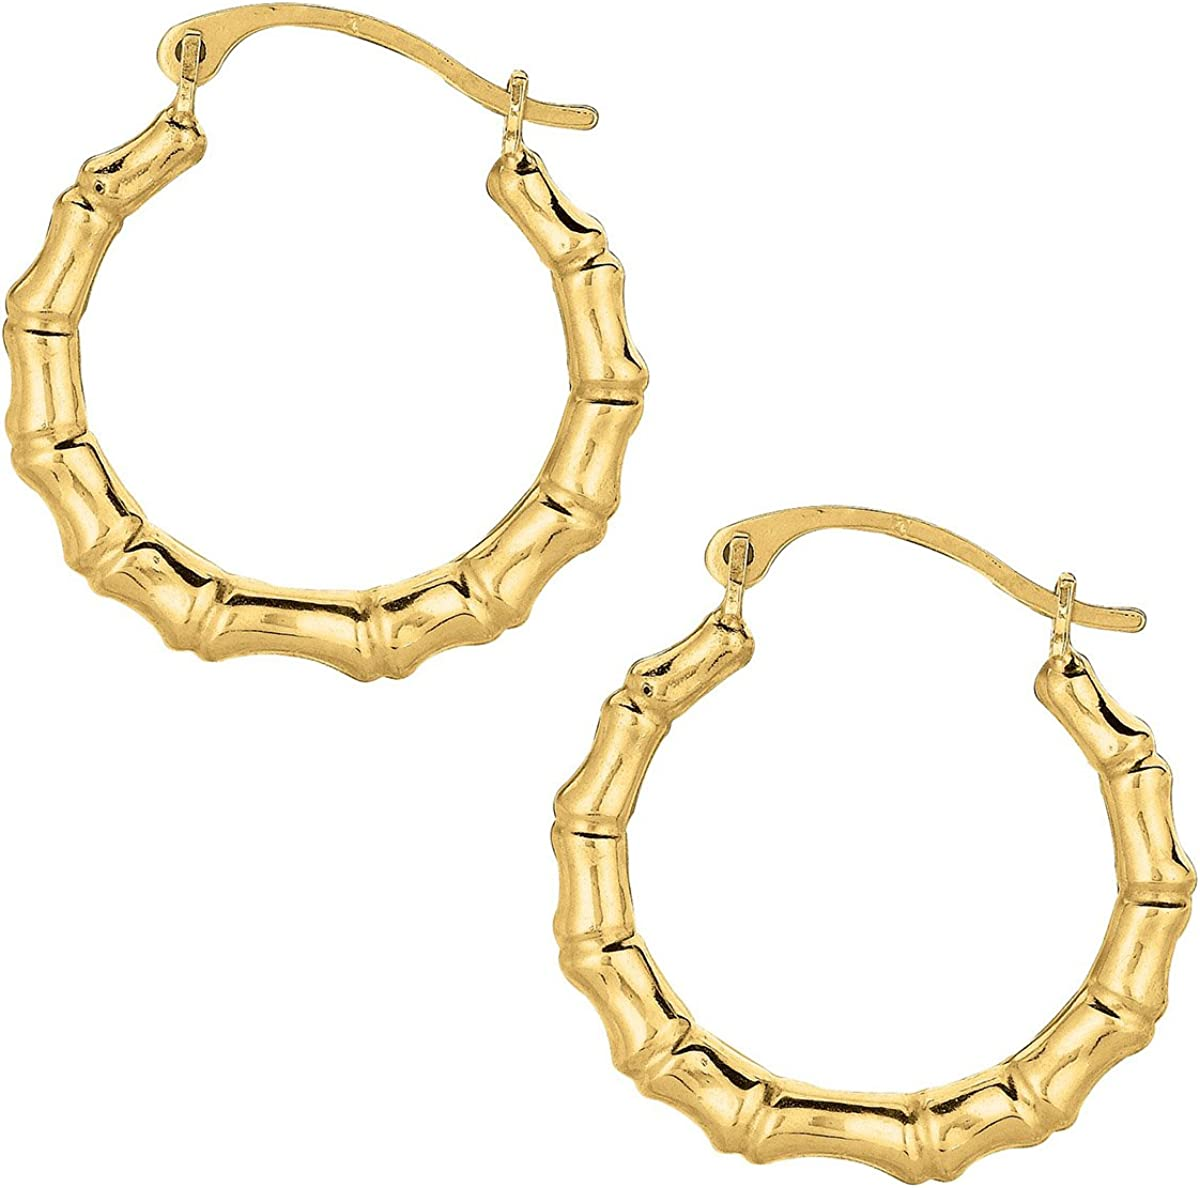 10k Yellow Gold Bamboo Hoop Earrings